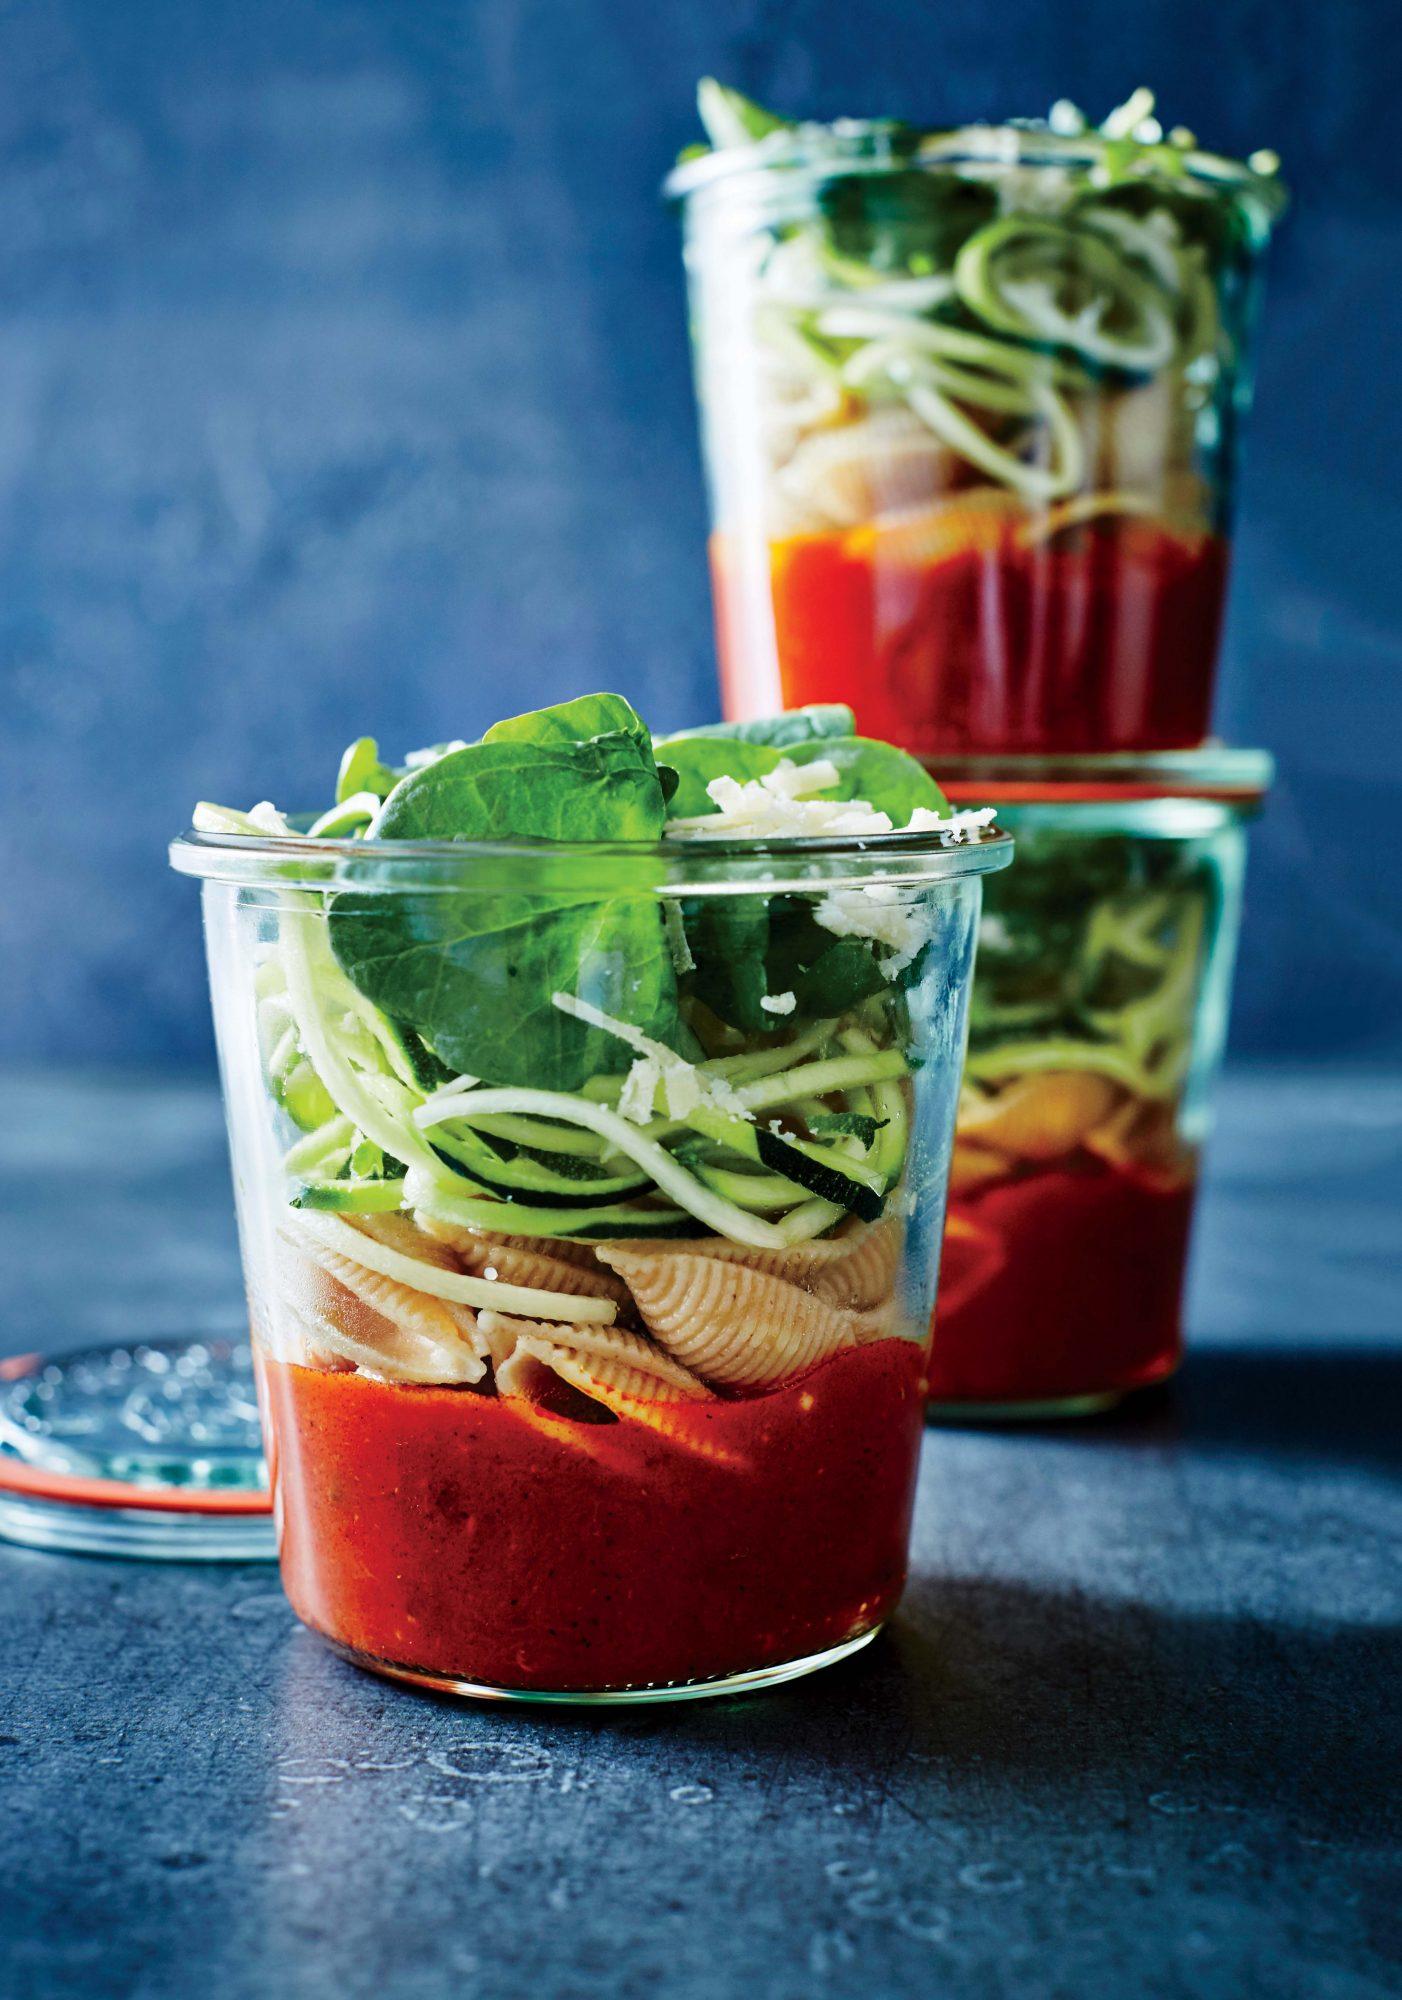 Tomato-Seashell Soup